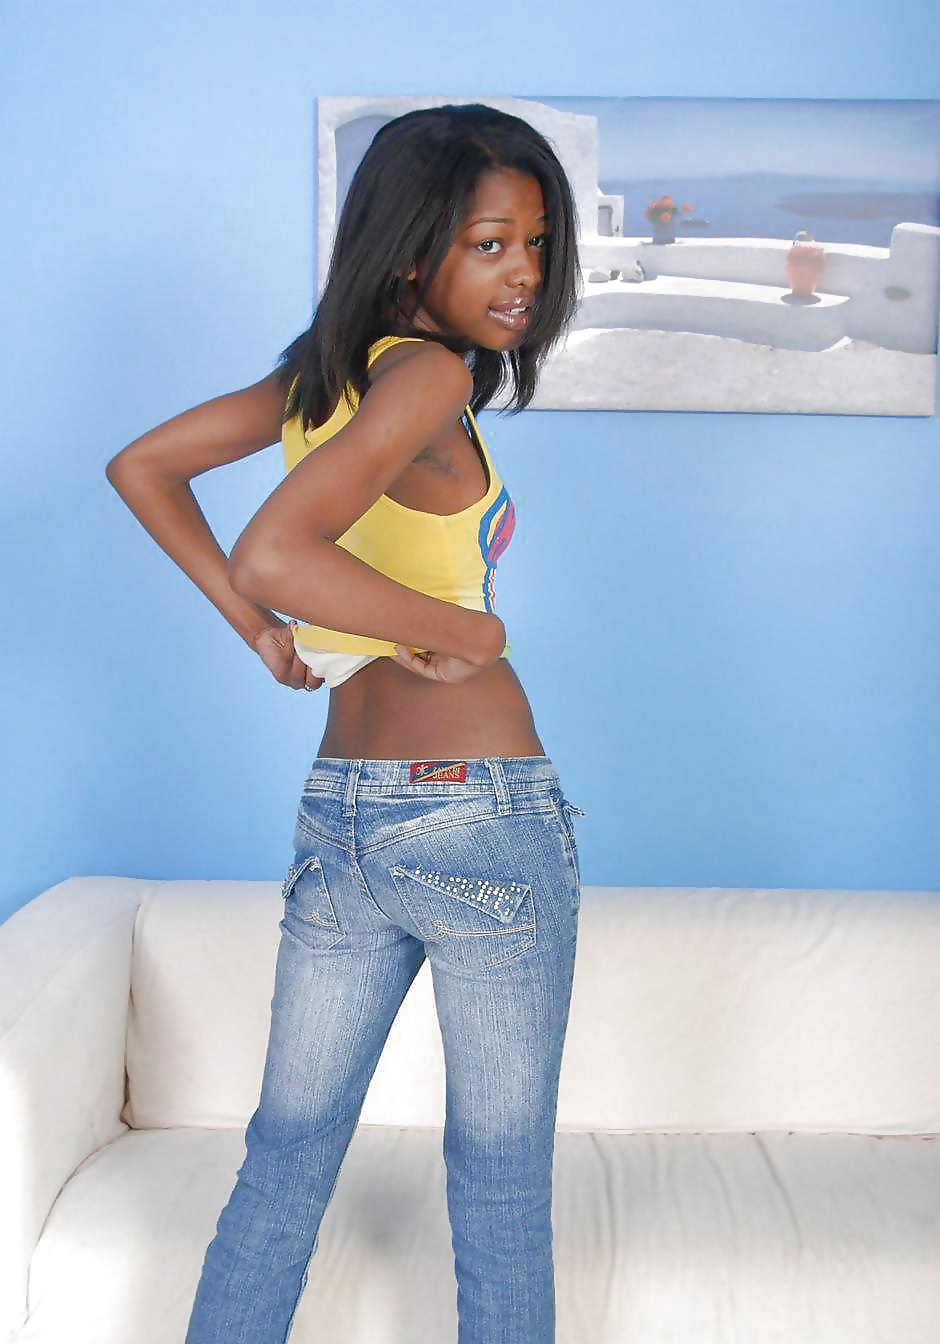 petite-black-teen-girls-xxx-are-blow-jobs-safe